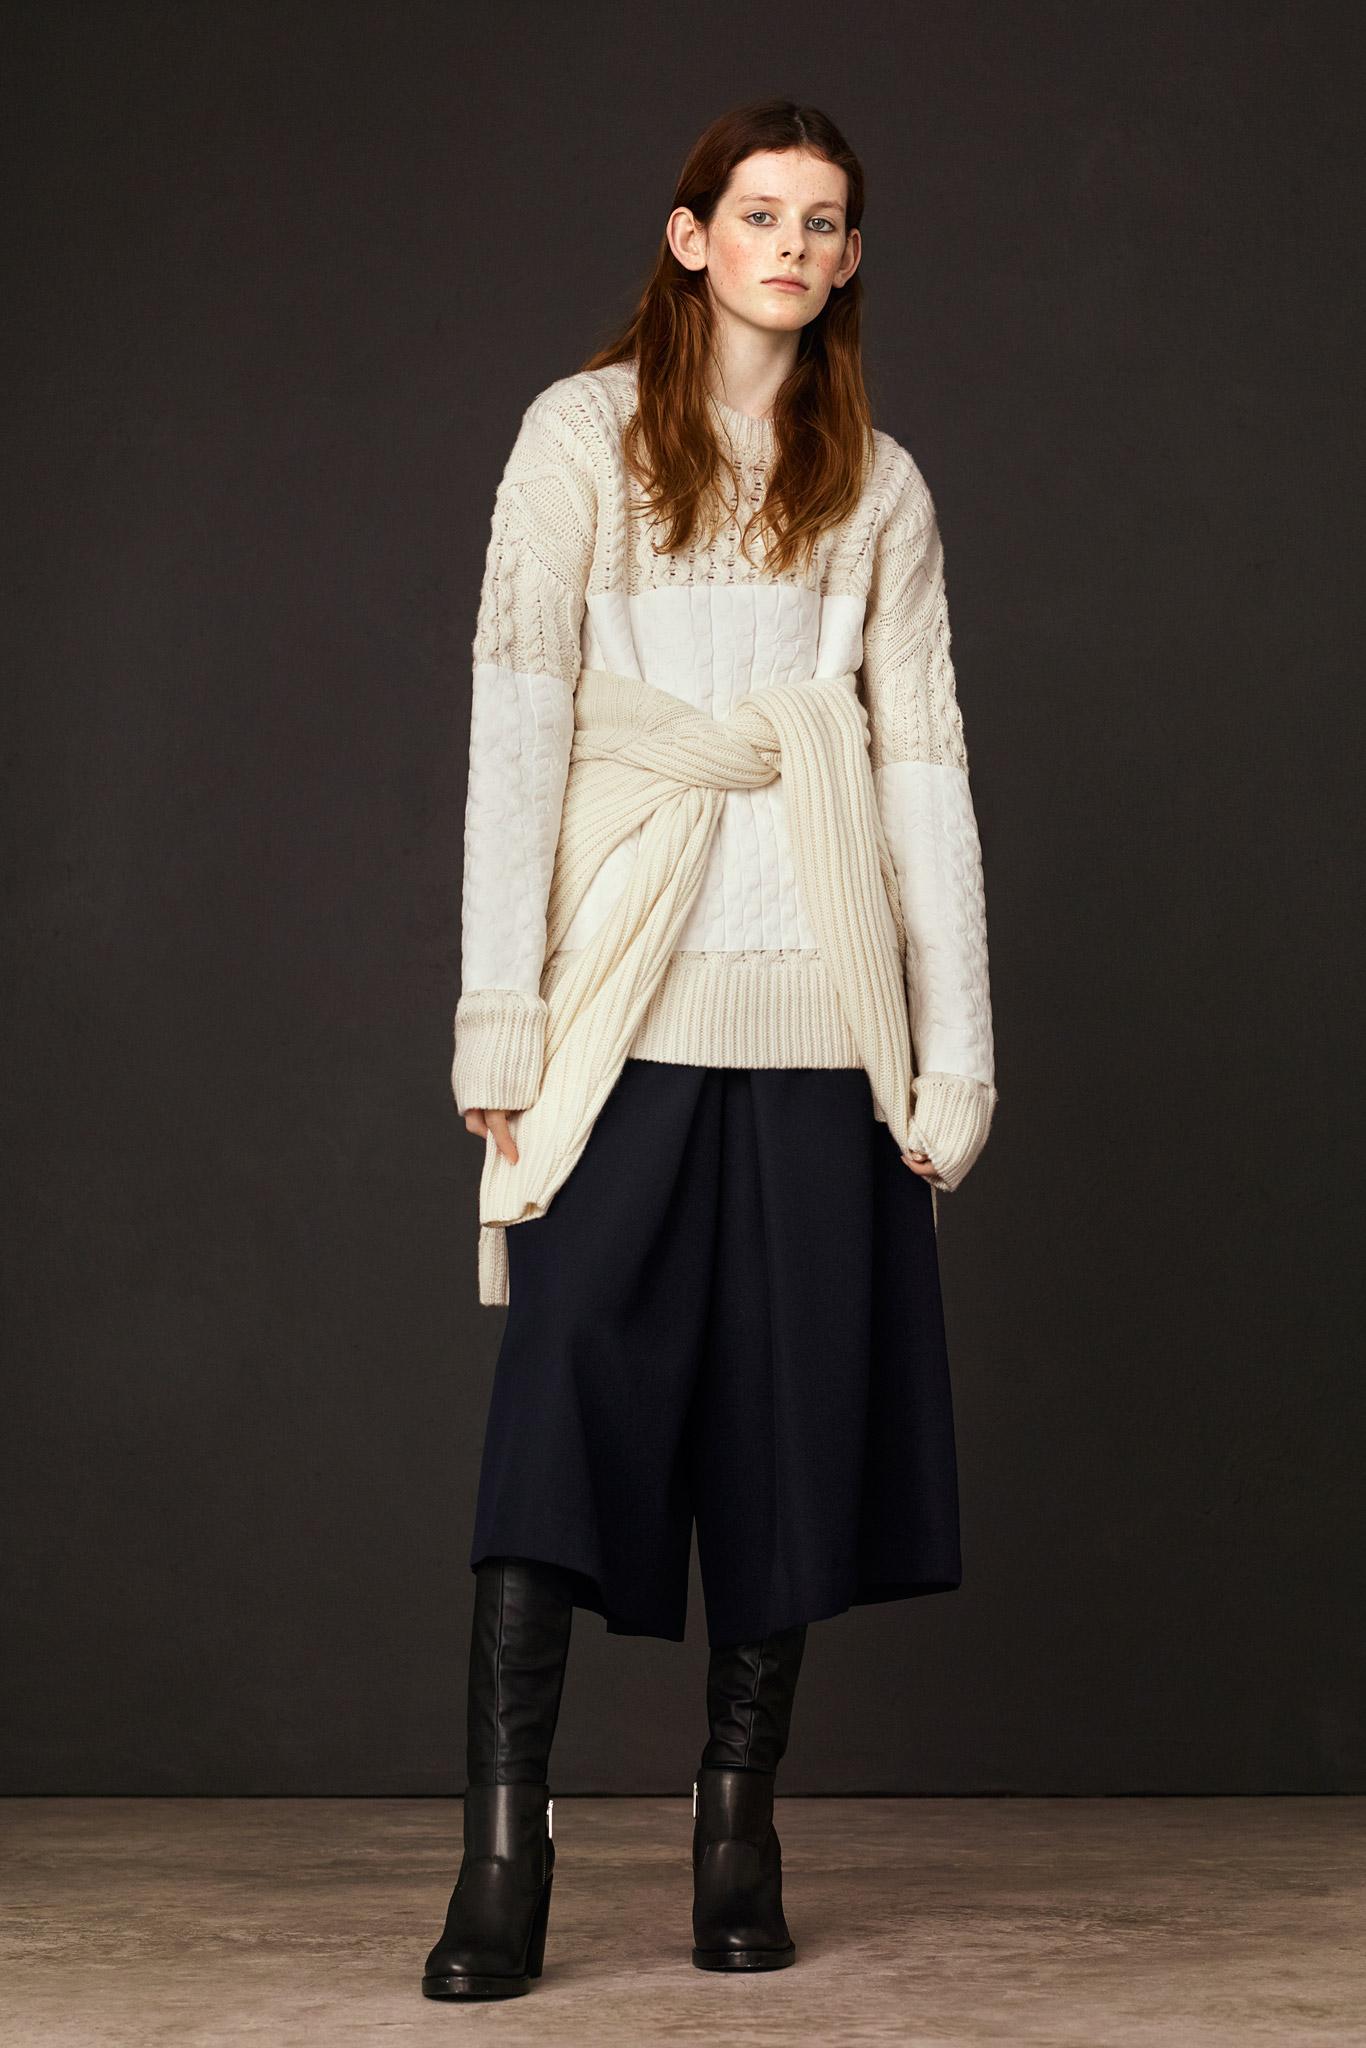 Fall 2015 Prêt-à-Porter: Knitwear